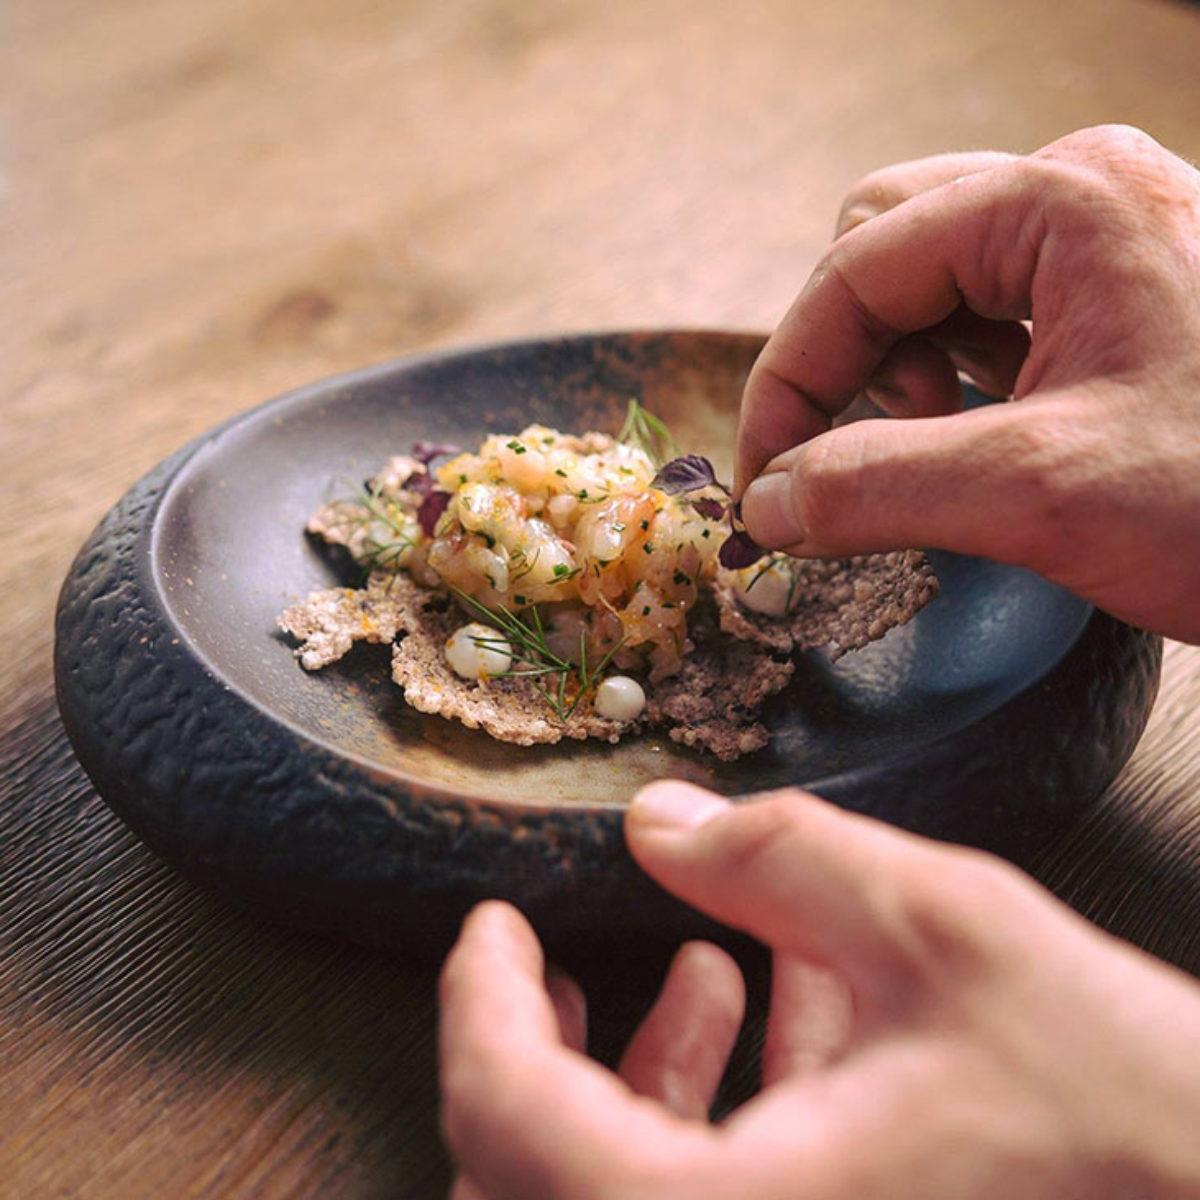 Yiamas Gastro Bar - Καλαμάτα - Μοντέρνα Ευρωπαϊκή Κουζίνα - Gastronomy